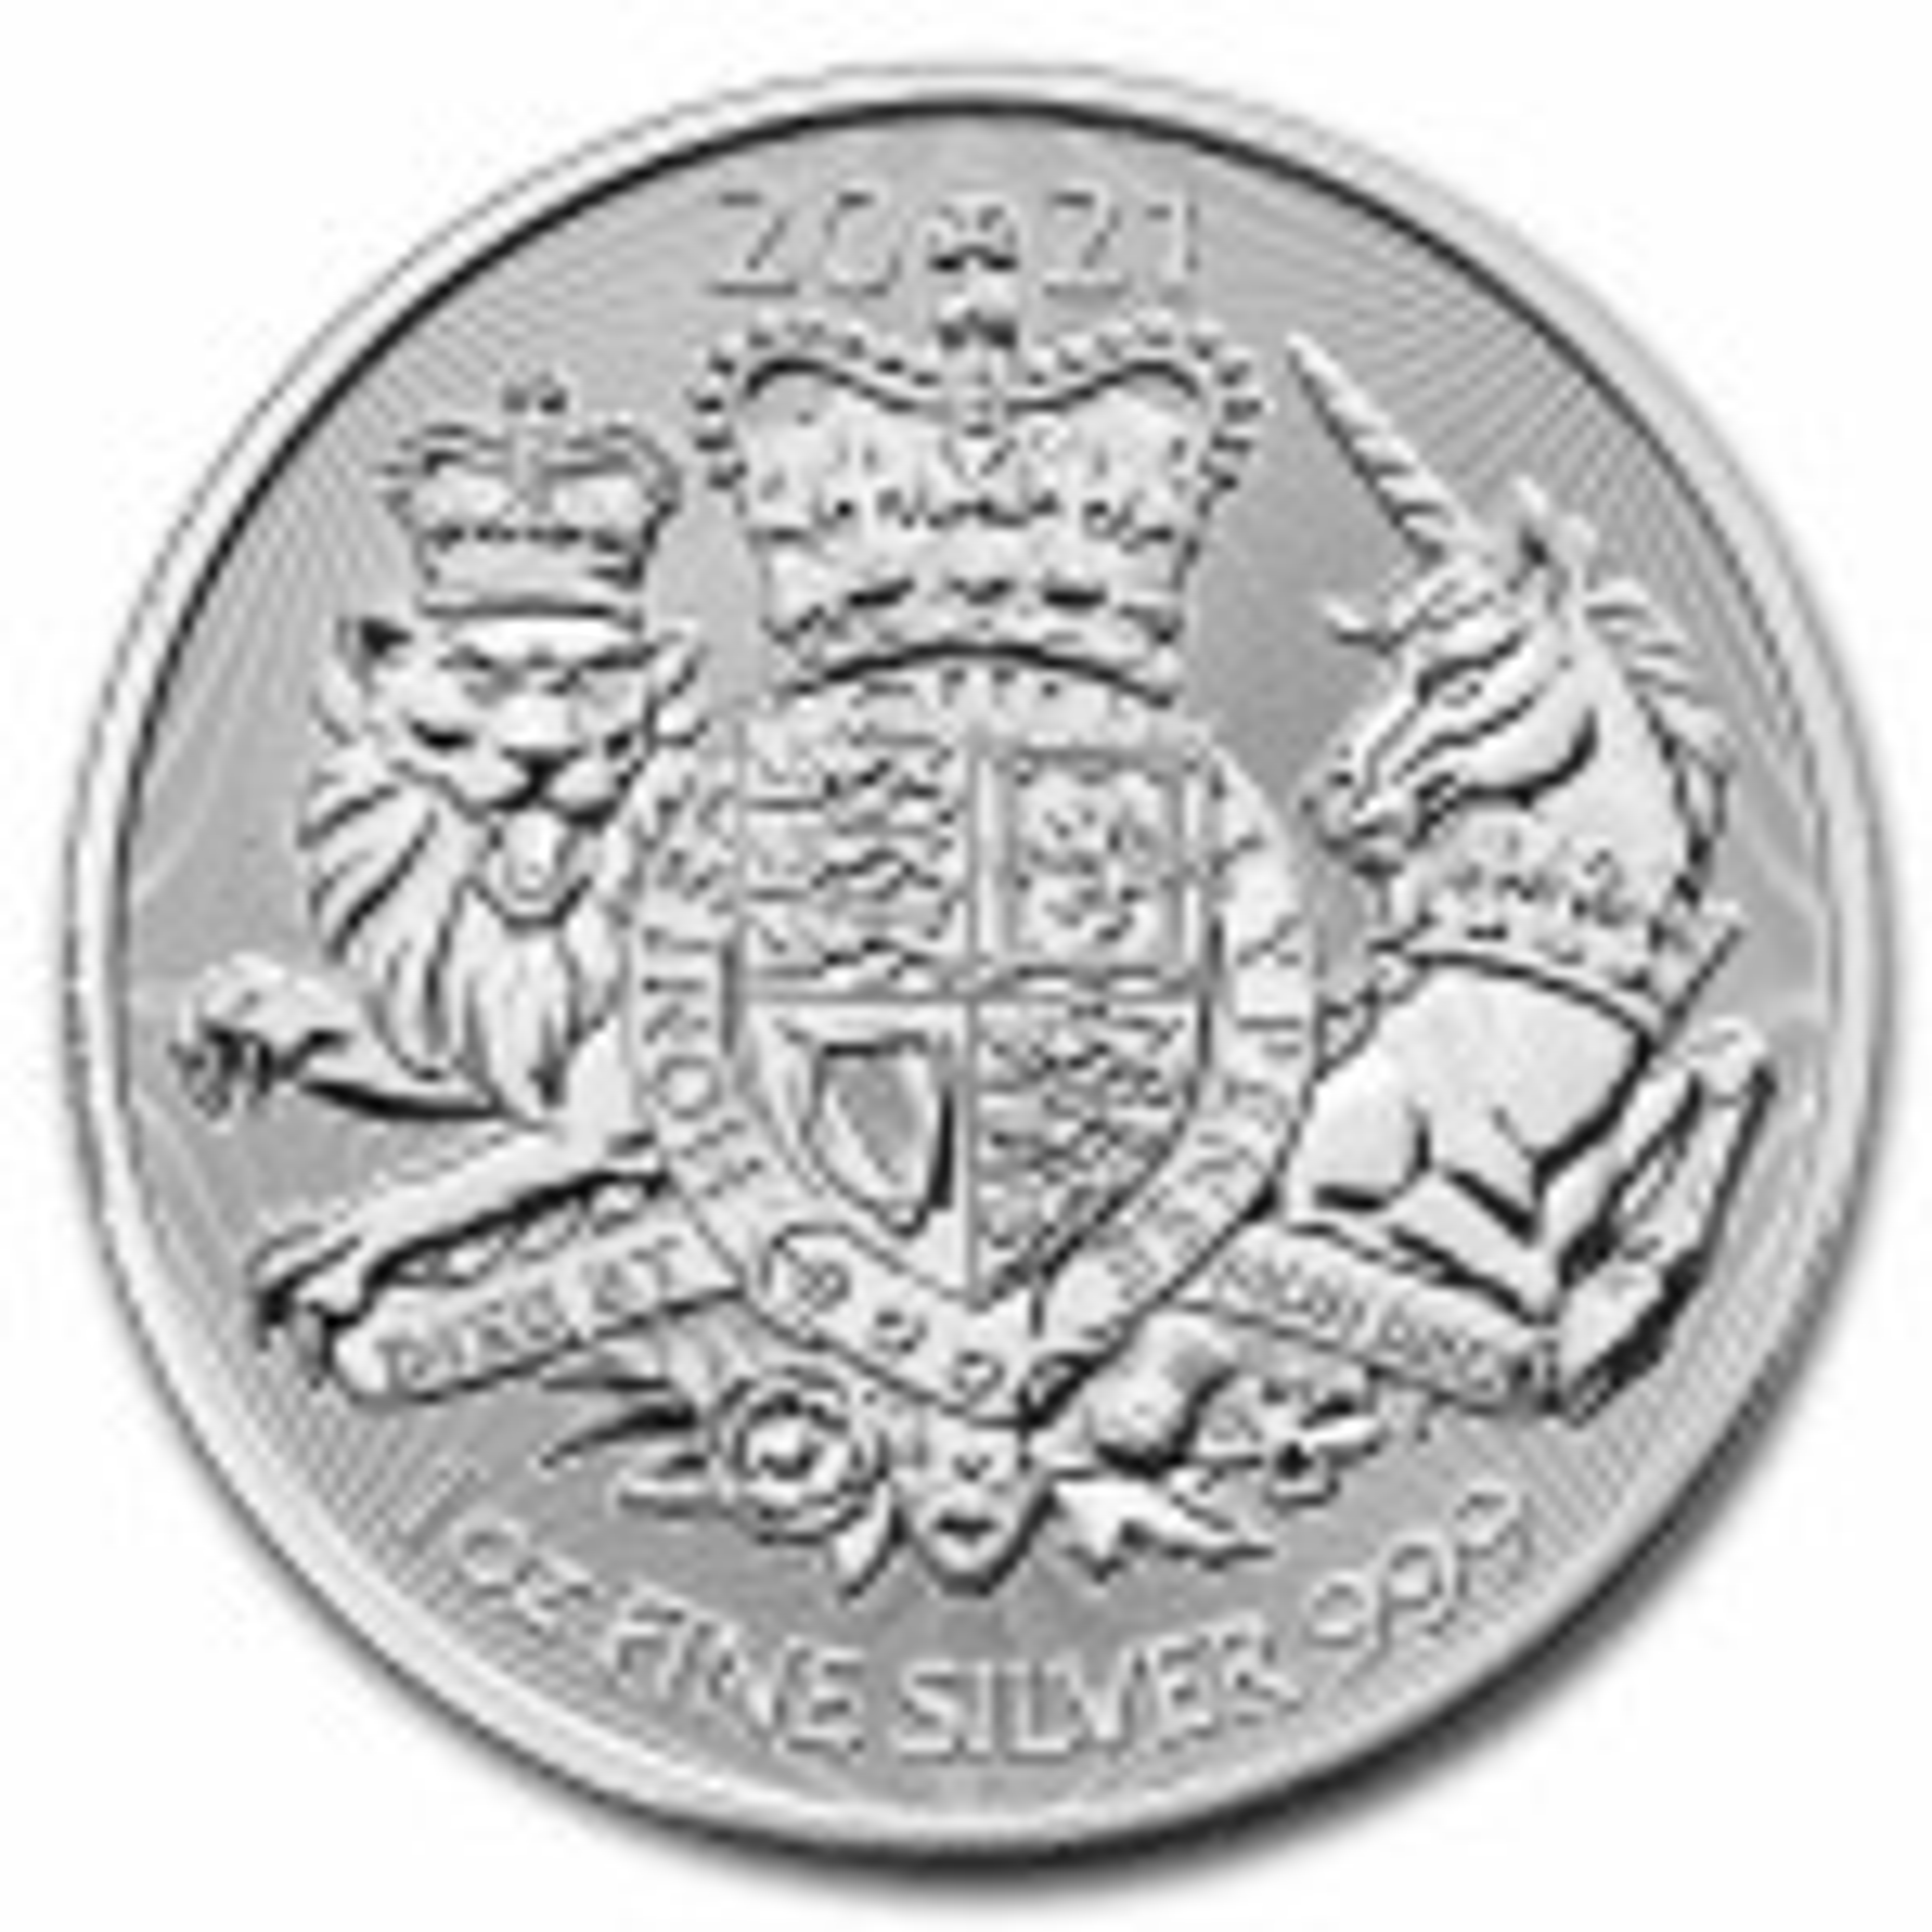 1 Troy ounce silver coin Royal Arms 2021